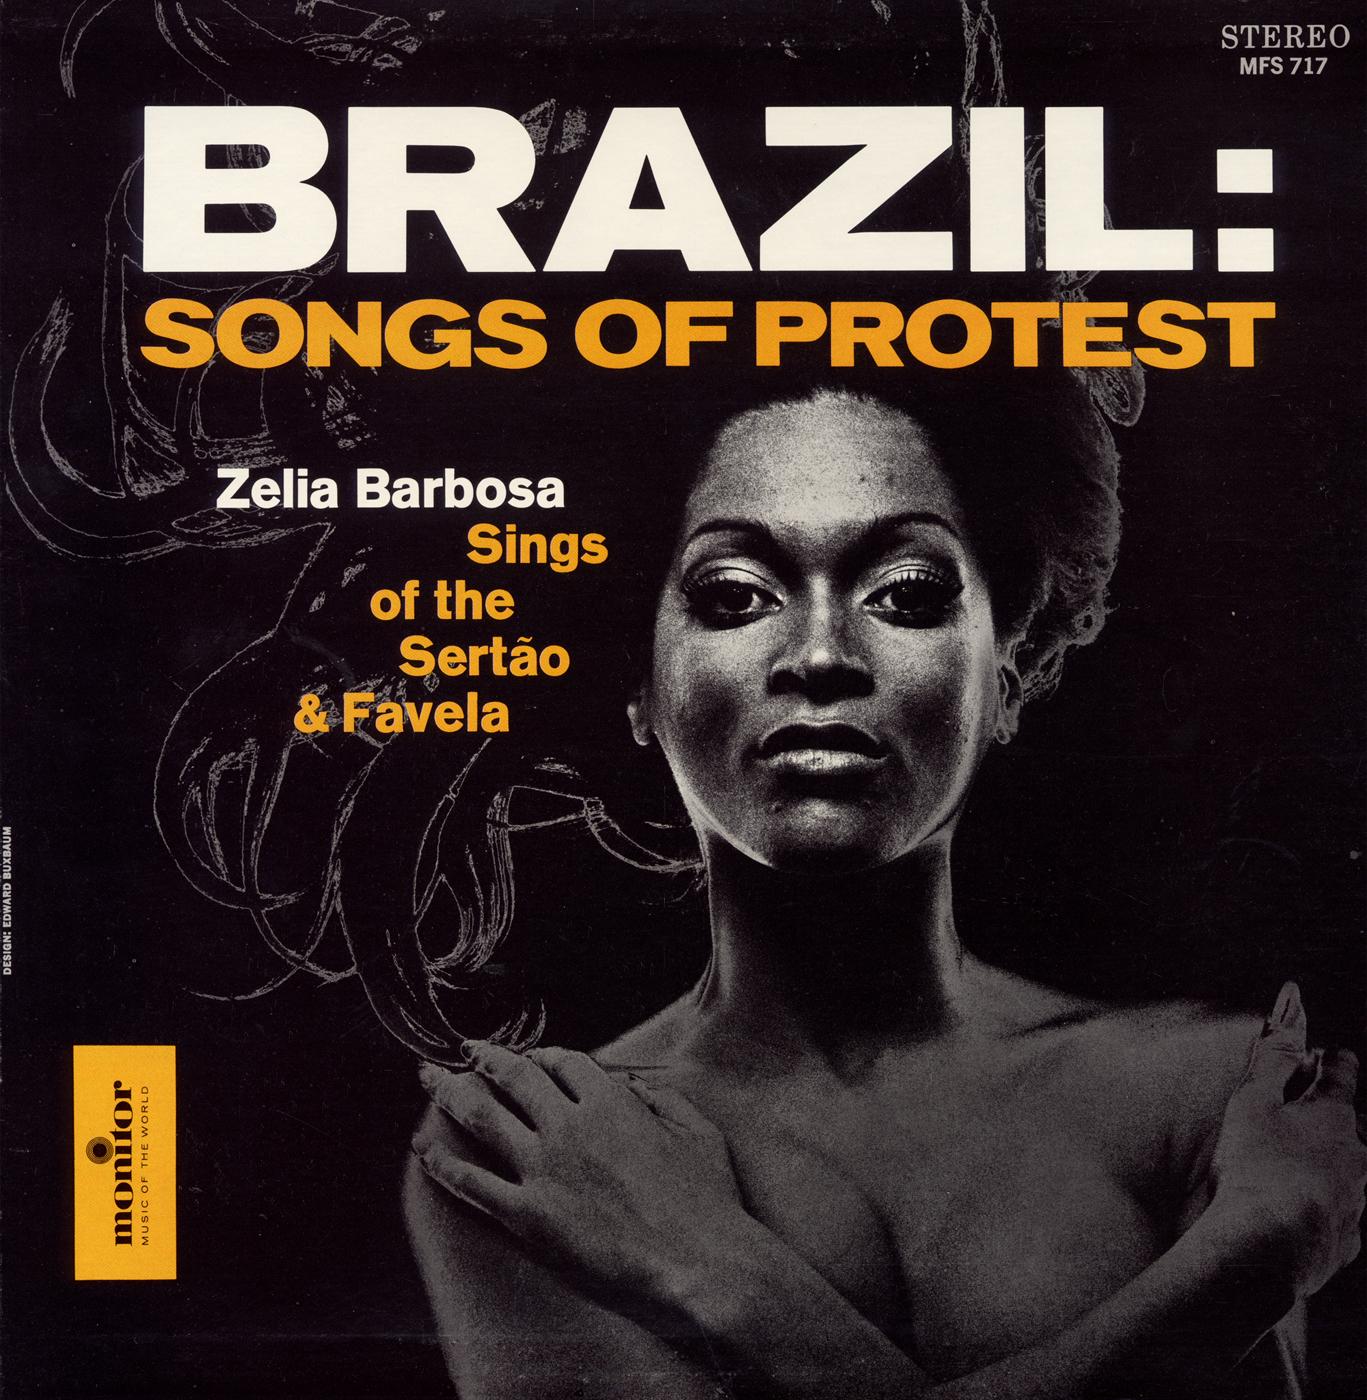 zelia barbosa brazil songs of protest